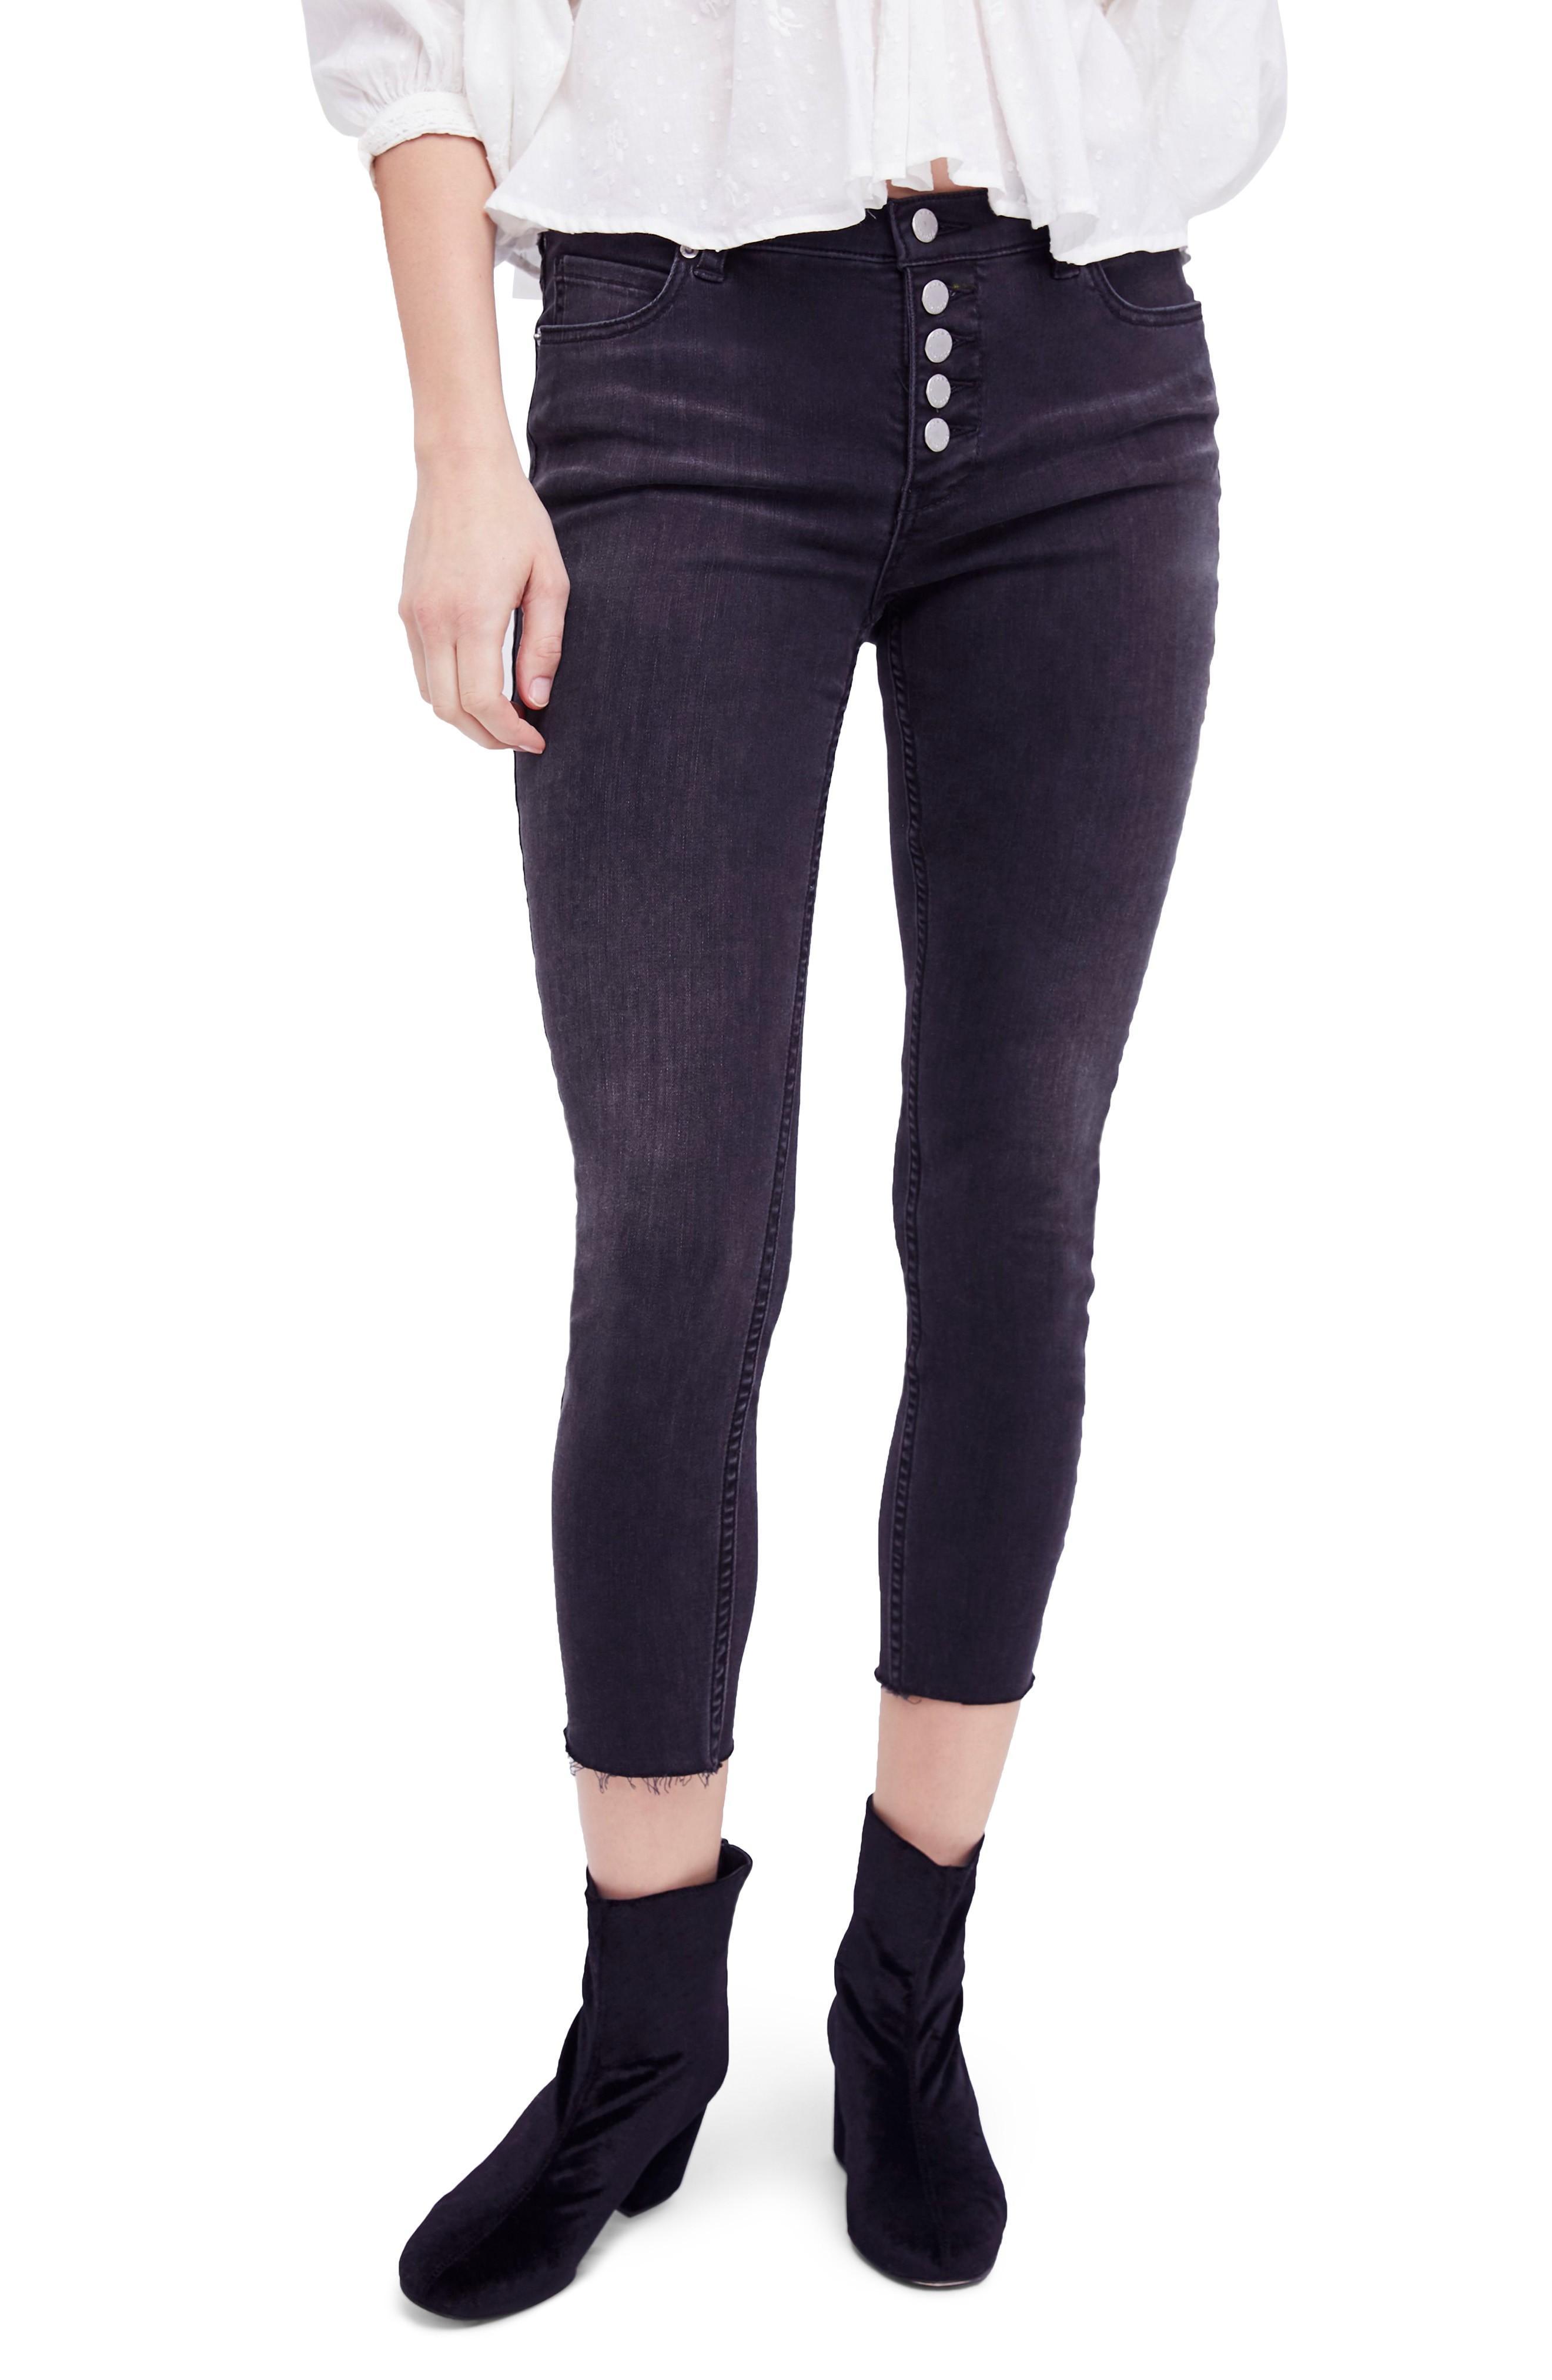 787b9fd35f5 Free People Reagan Crop Skinny Jeans In Black